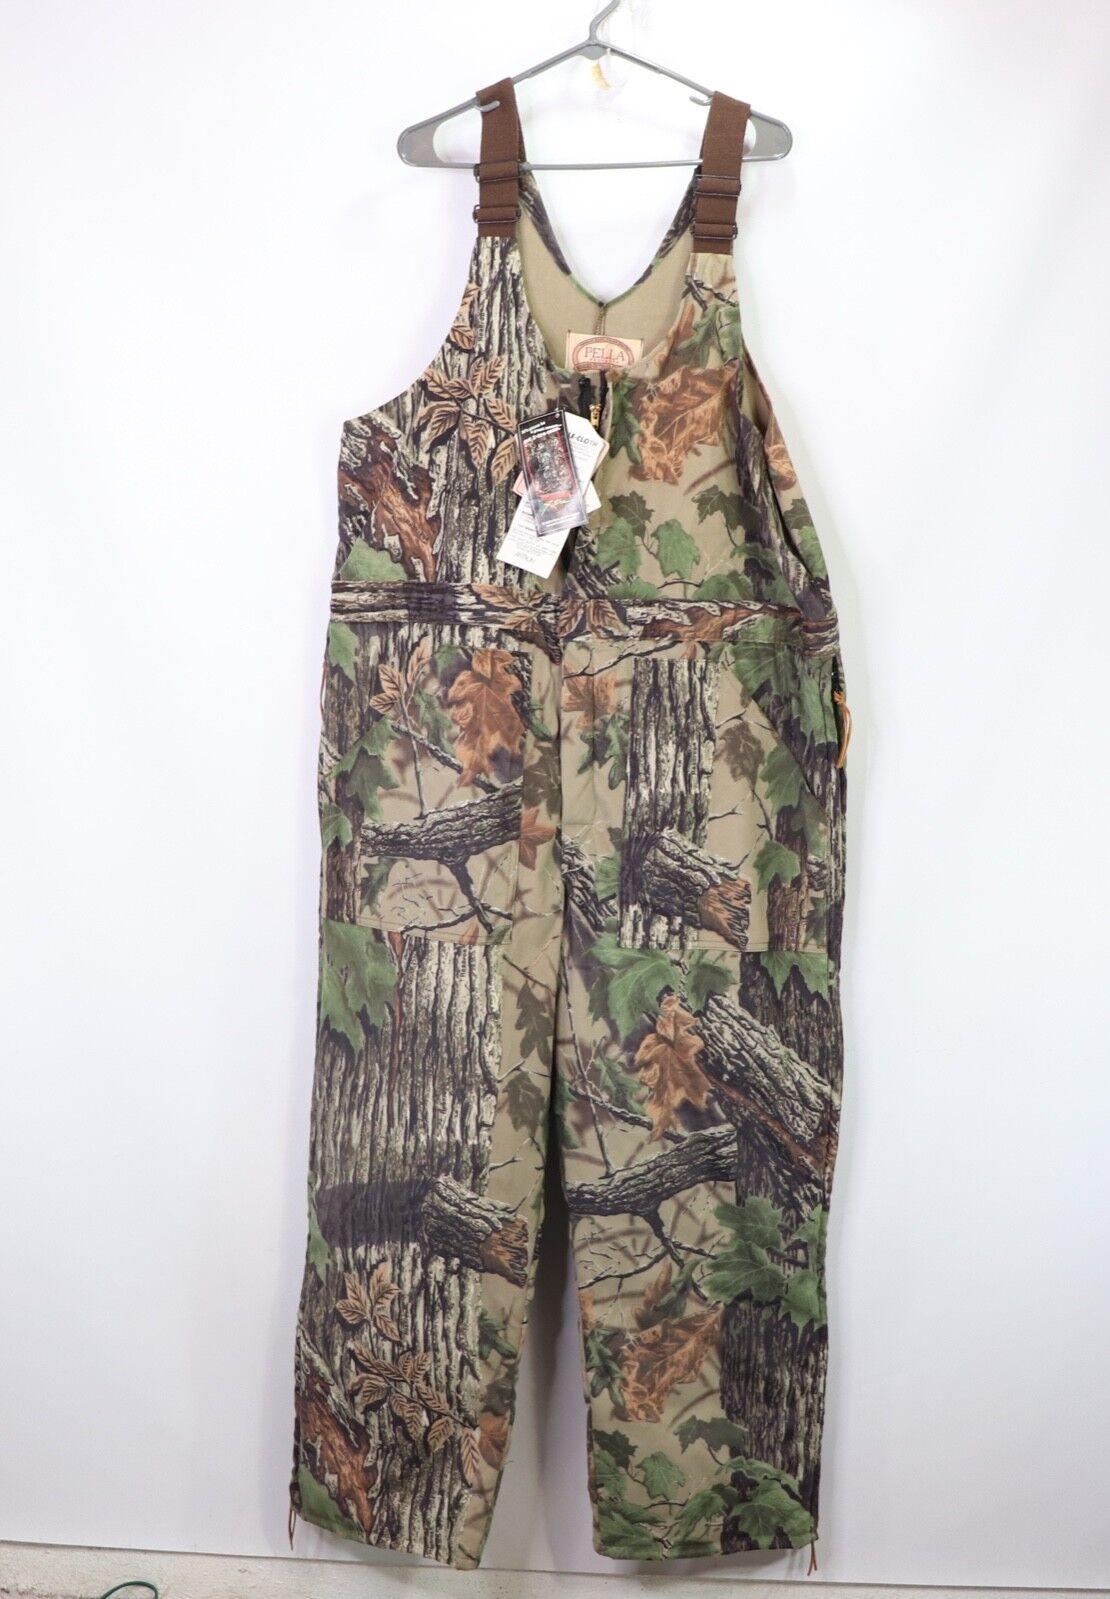 Vintage 90s New Pella Mens Large Saddlecloth Realtree Xtra Insulated Hunting Bib